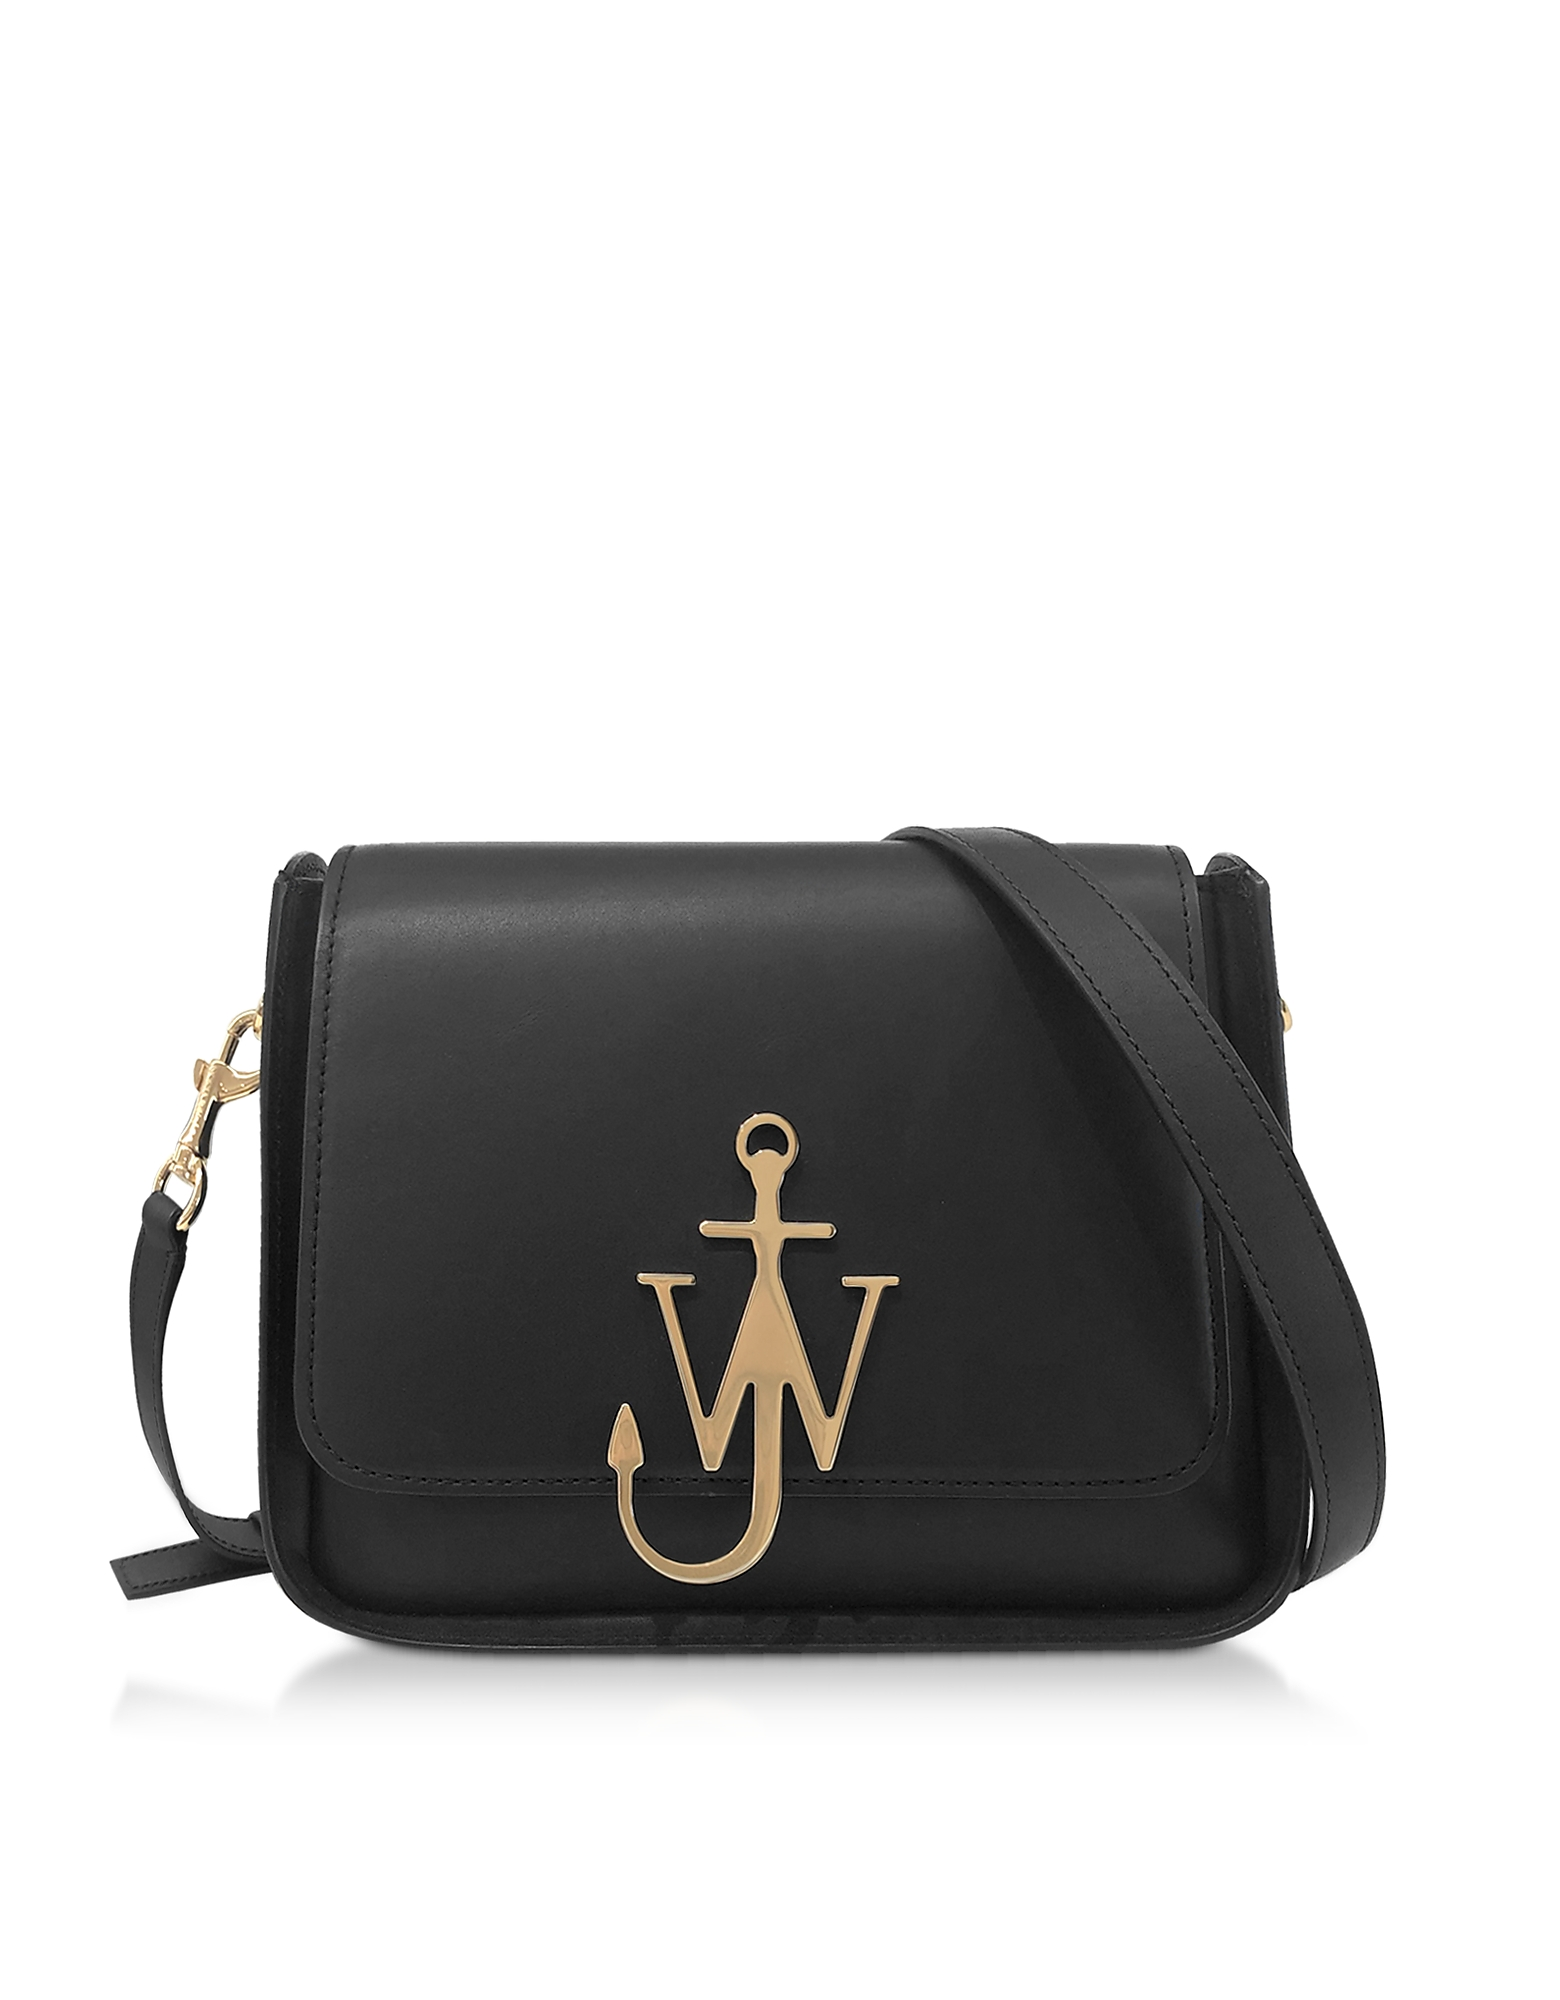 JW Anderson Designer Handbags, Black Anchor Logo Box Bag